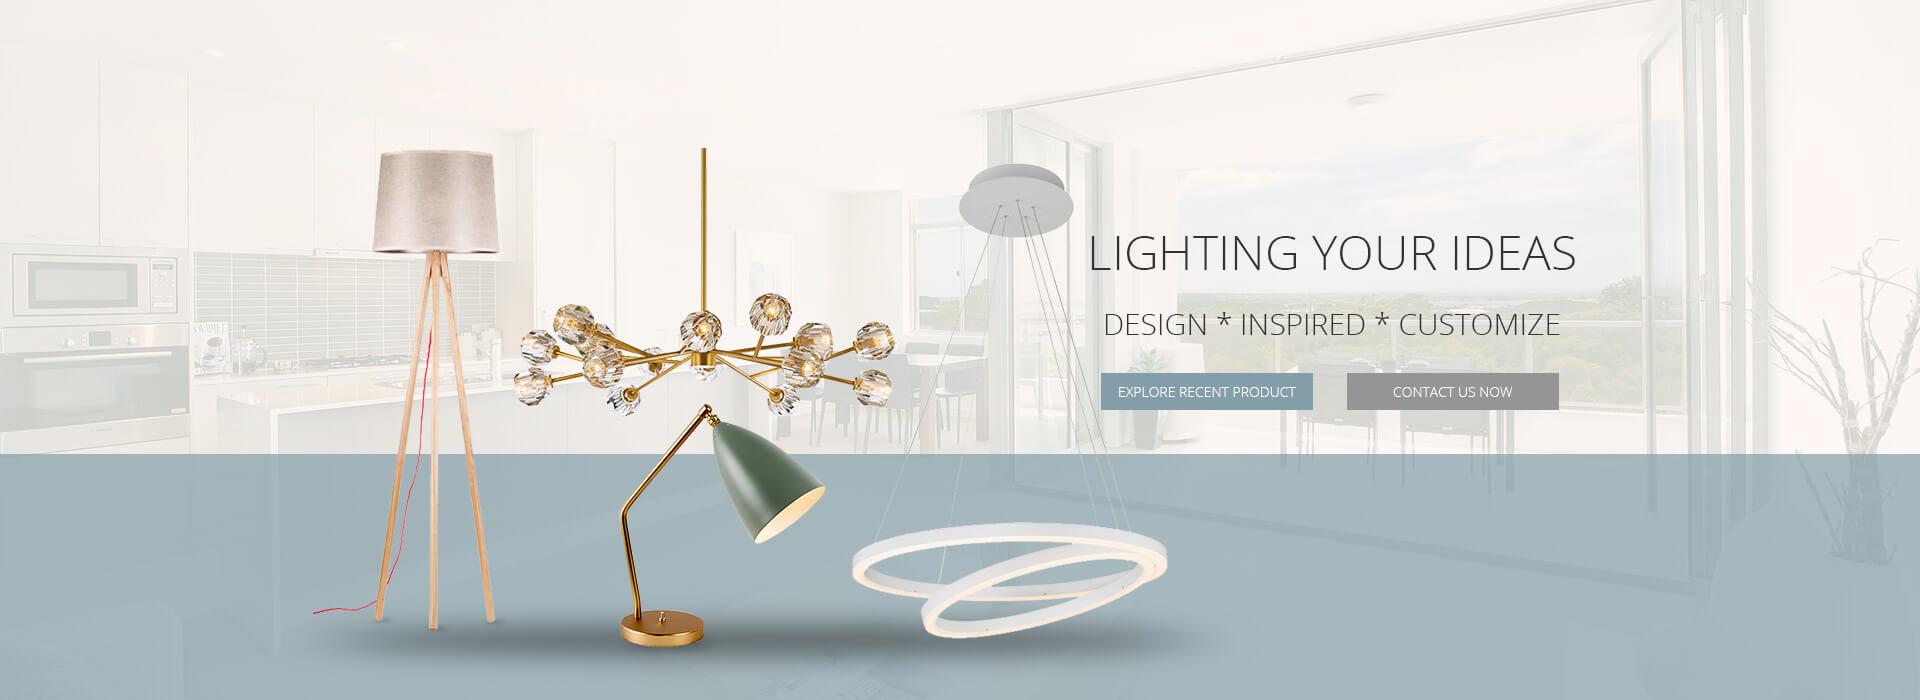 Inlamp Co.,Ltd Main Image